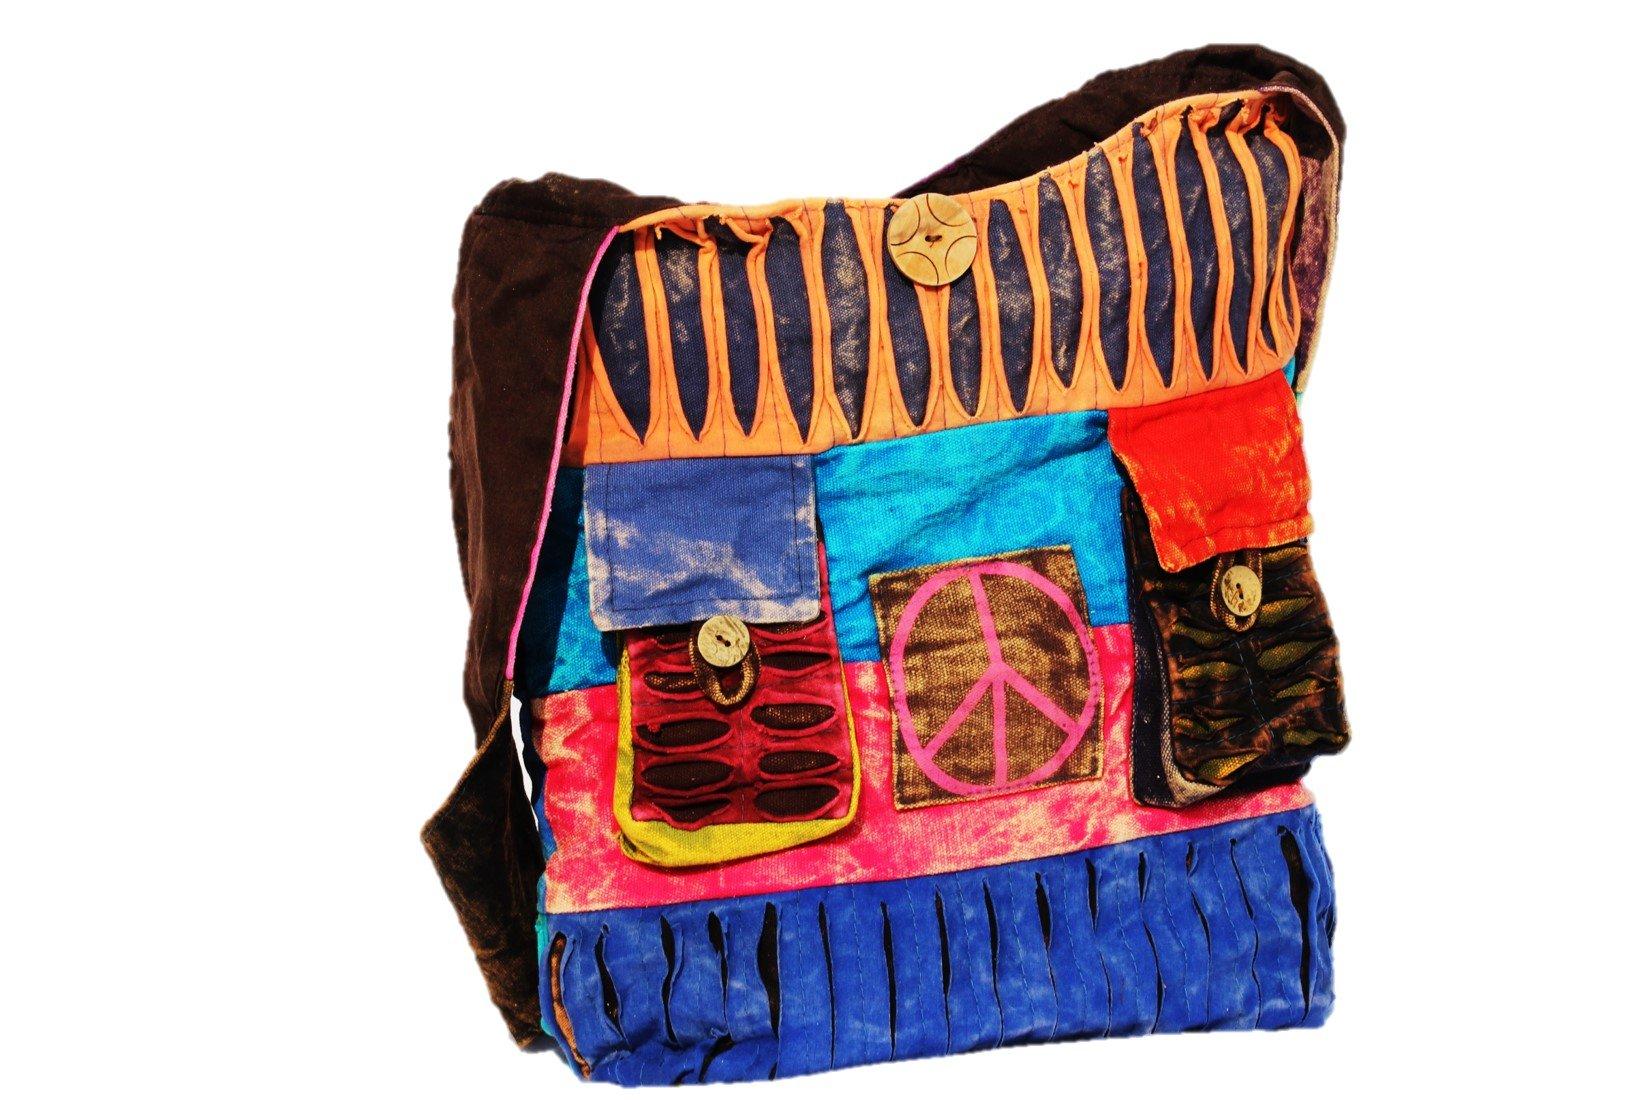 TRIBESMAN-Blue Red Hobo Cotton Sling Cross Body Messenger Shoulder Bag Hippie Boho Bohemian Light Roomy Spacious